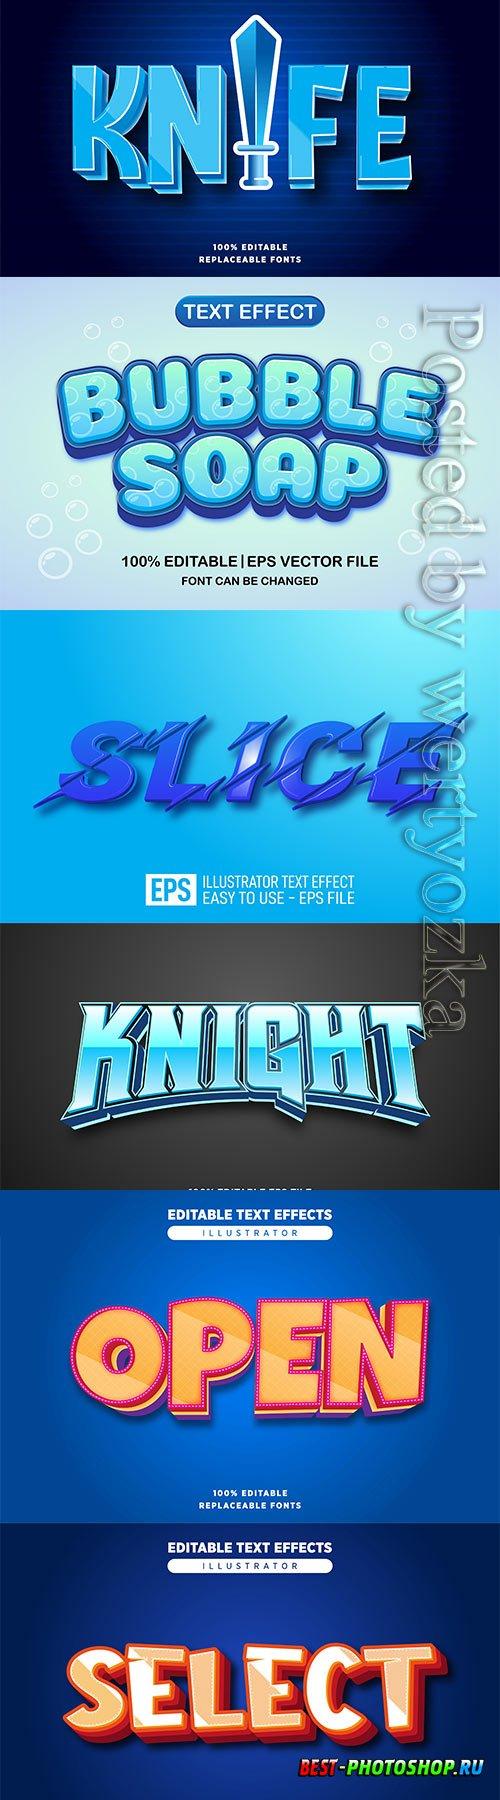 3d editable text style effect vector vol 522